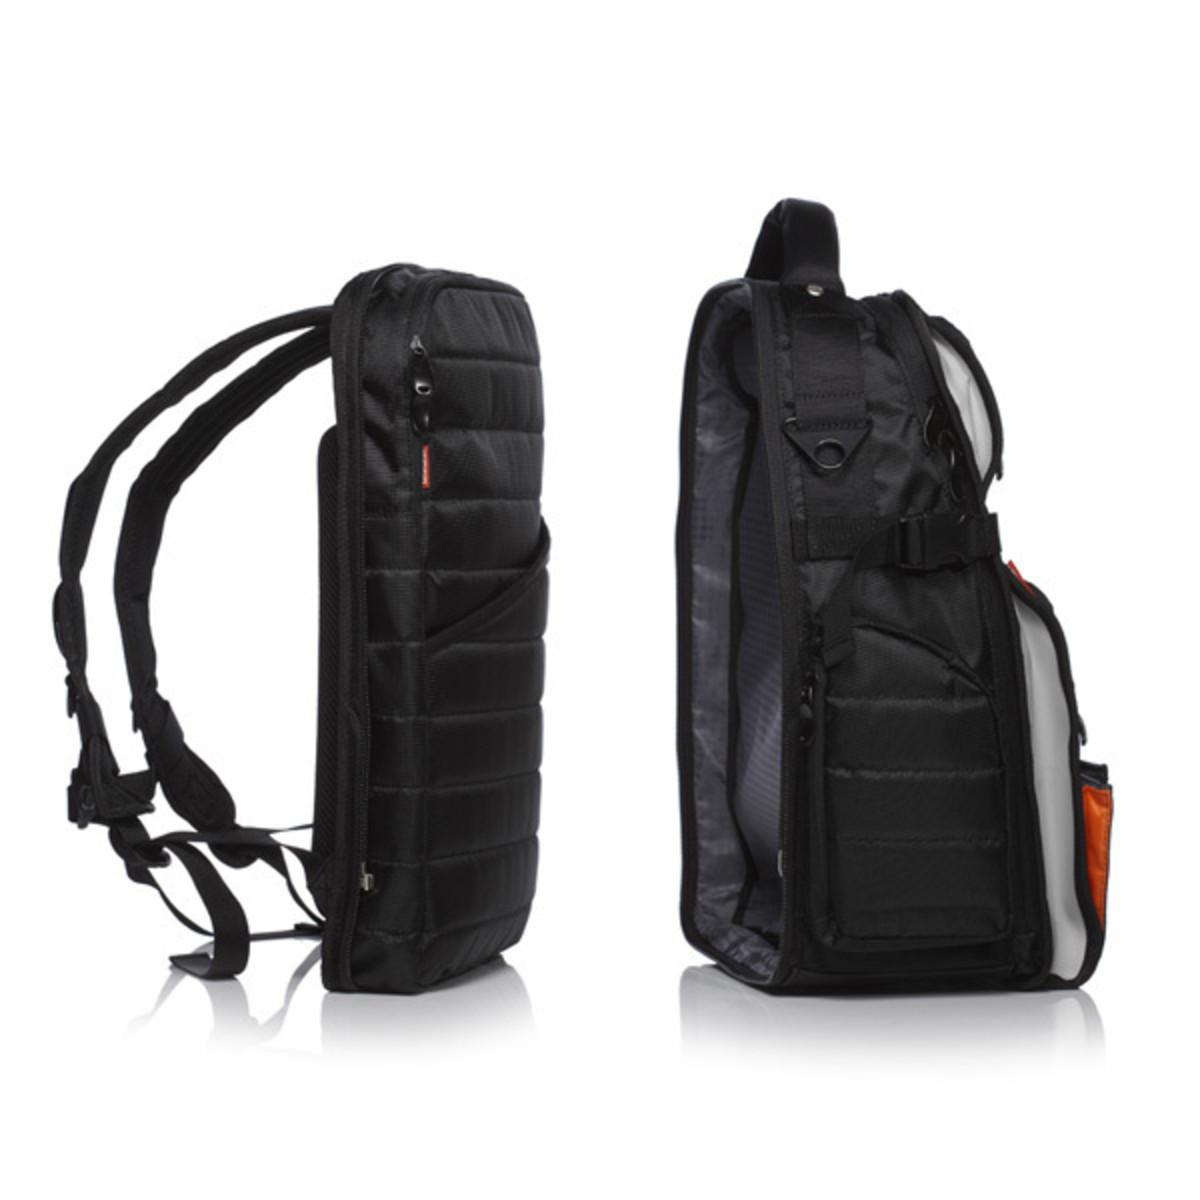 disc mono flyby bag black at gear4music. Black Bedroom Furniture Sets. Home Design Ideas